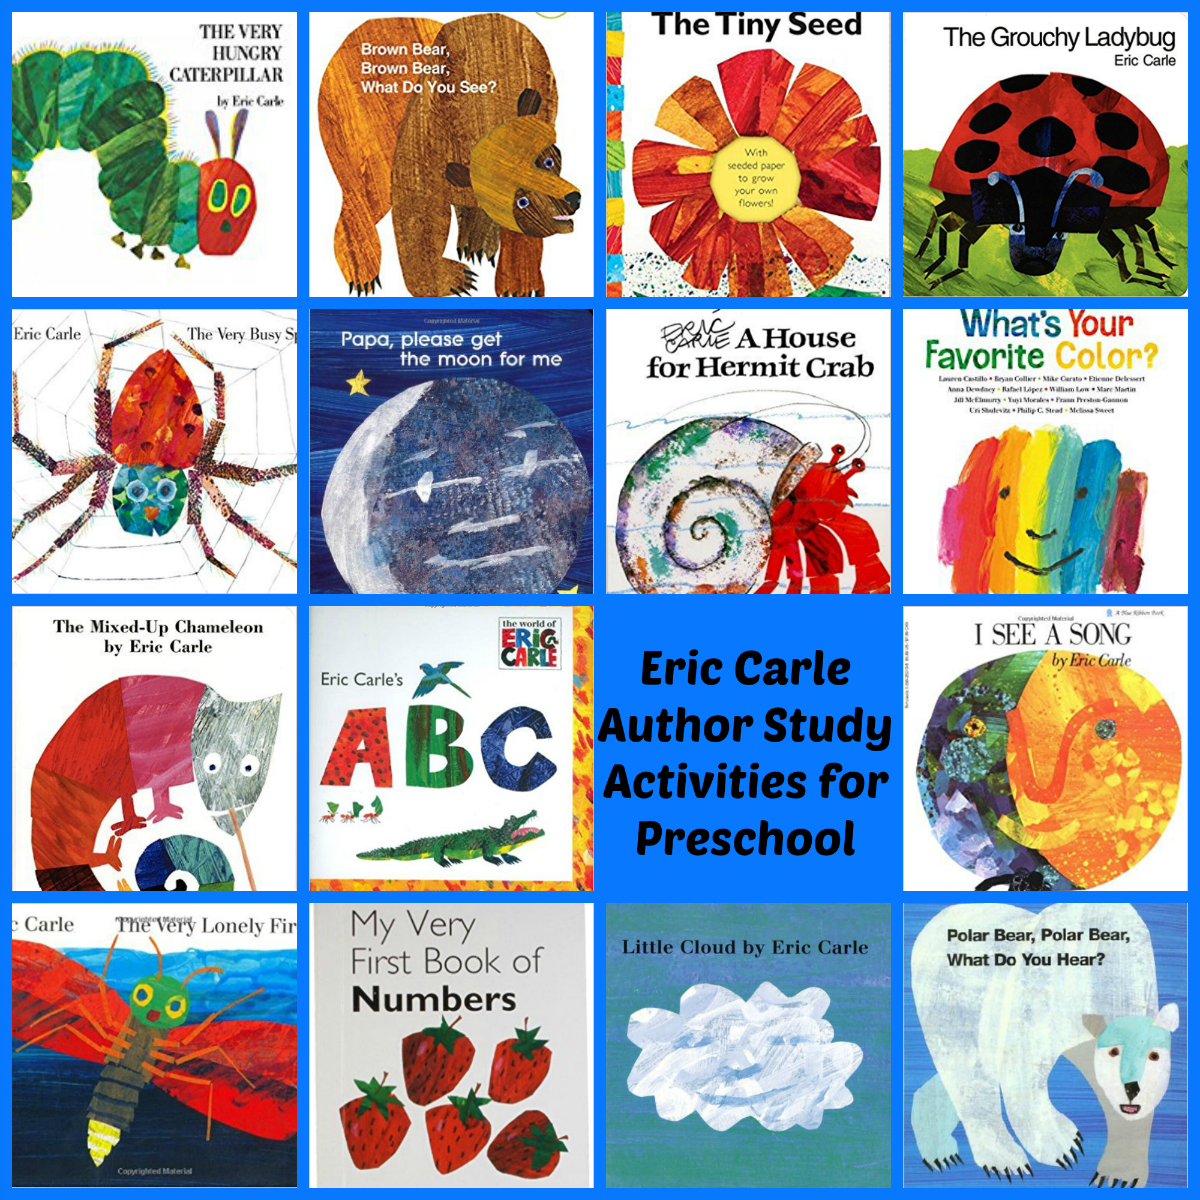 Eric Carle Books for Preschoolers!